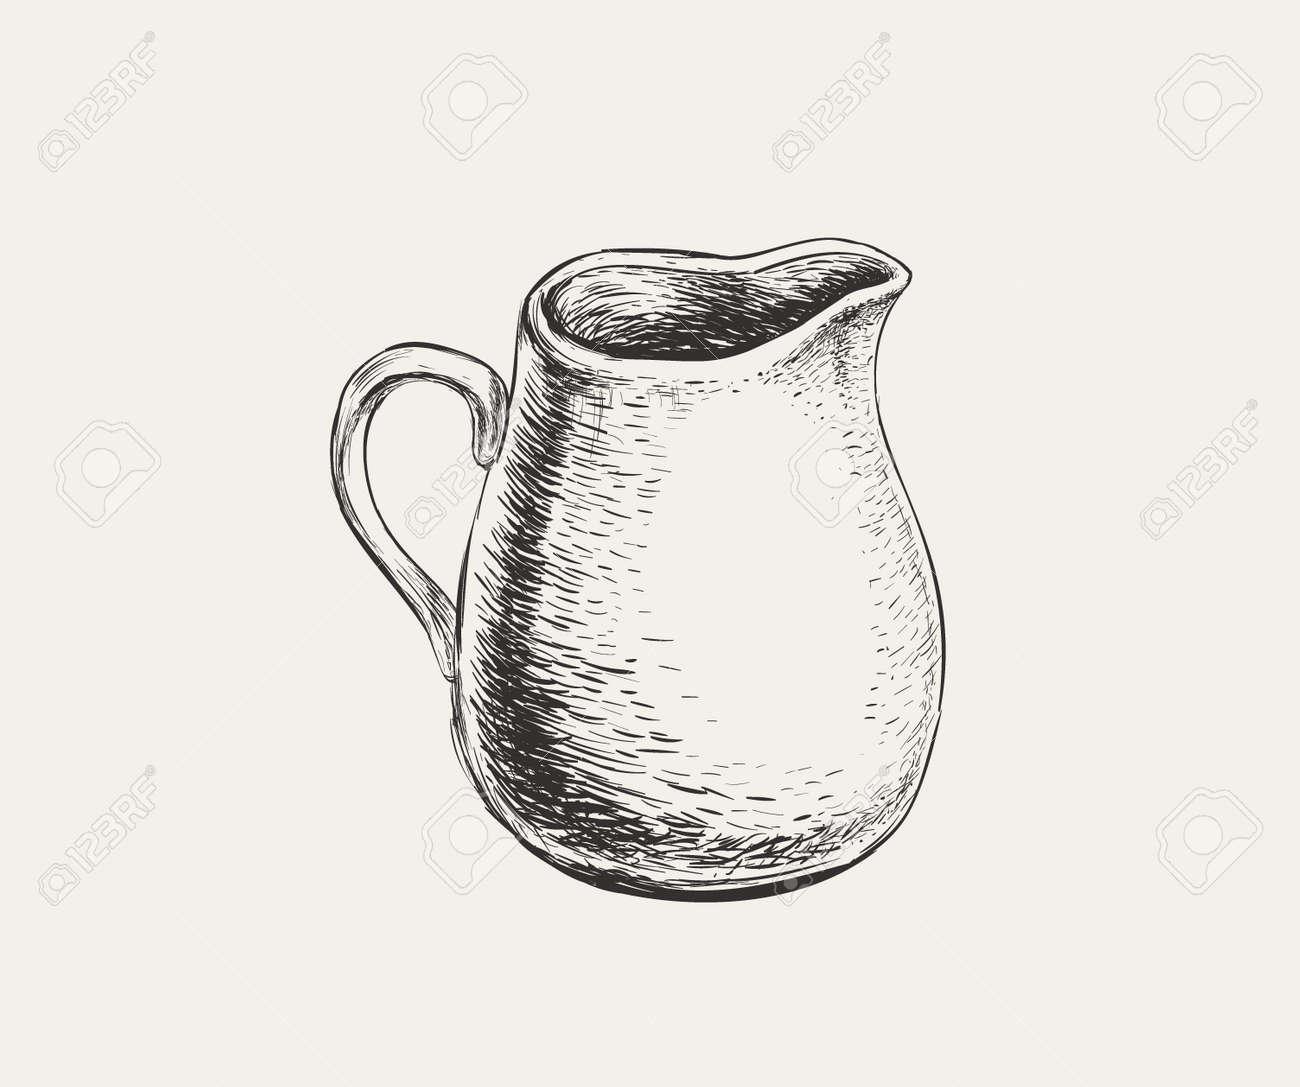 Hand Drawn Sketch Jug. Vector Illustration. - 172478402